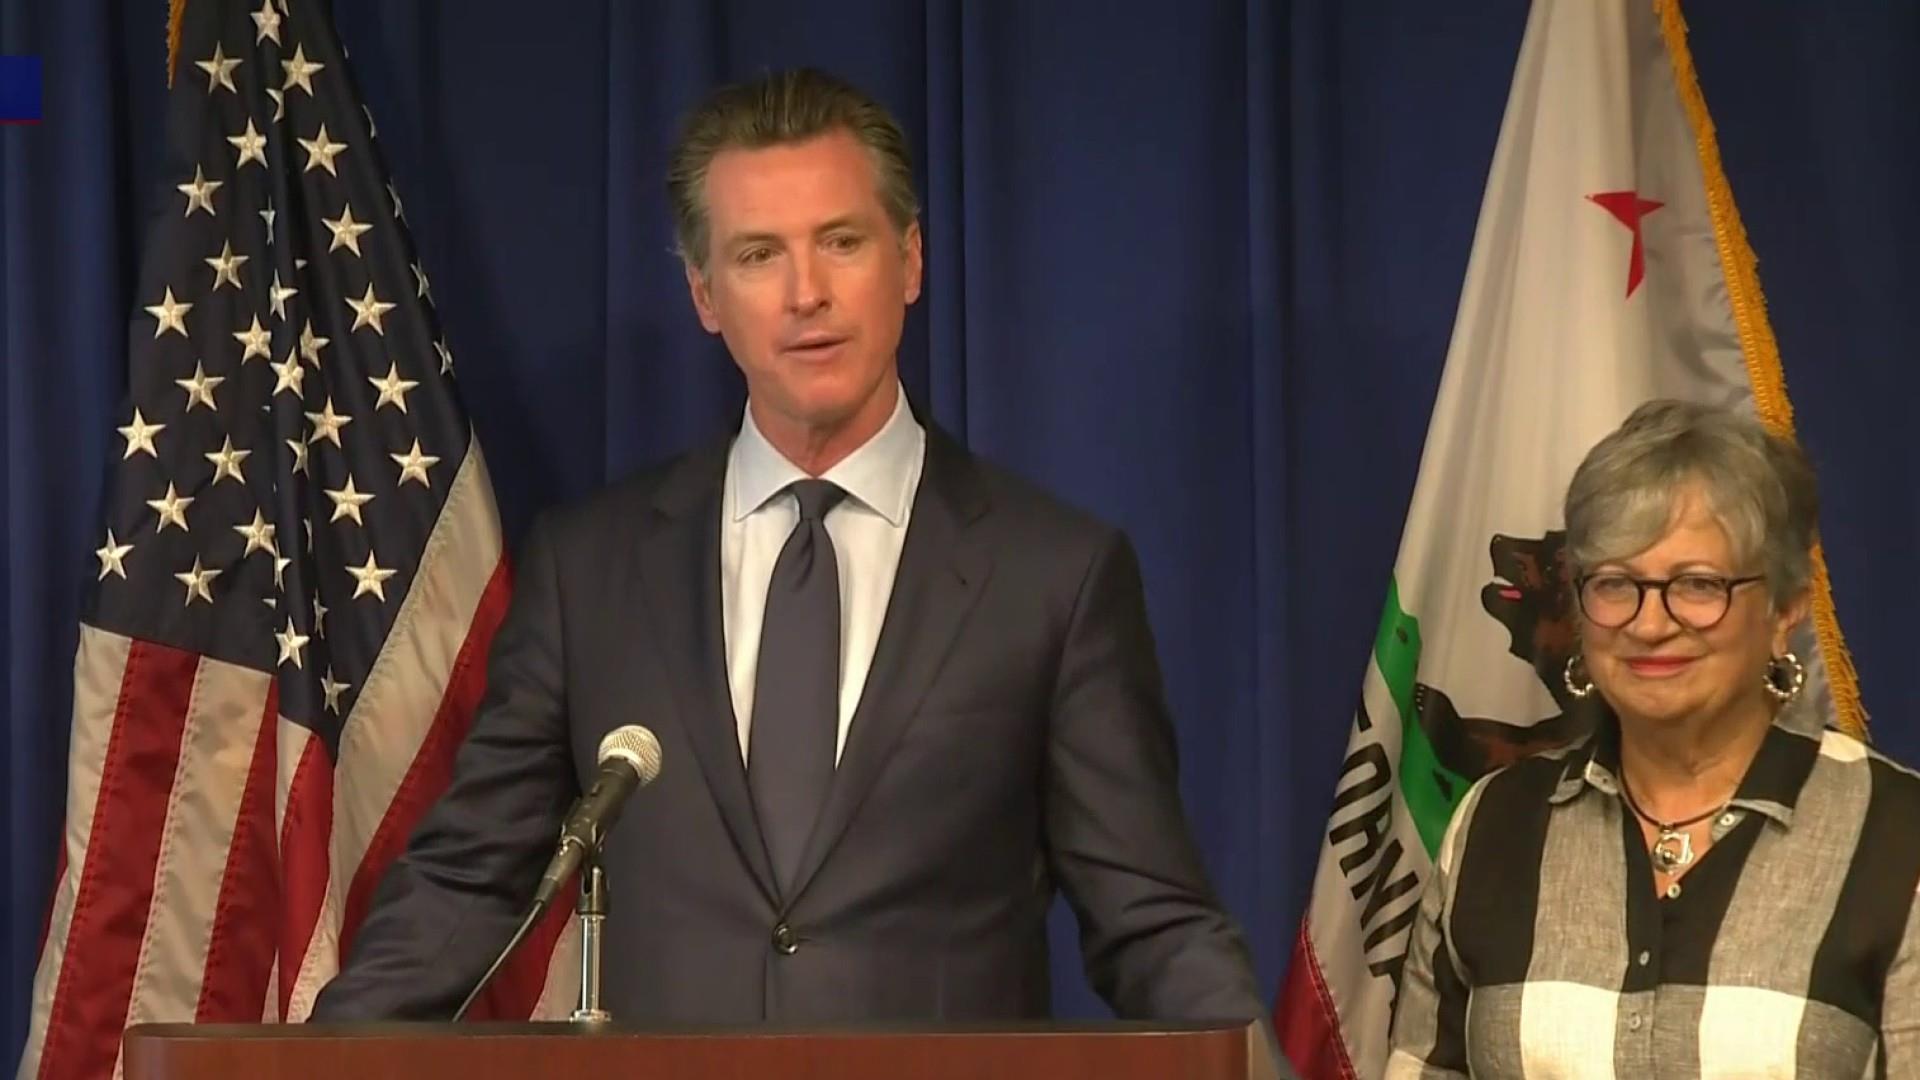 Gavin Newsom slams Trump for revoking California emissions waiver